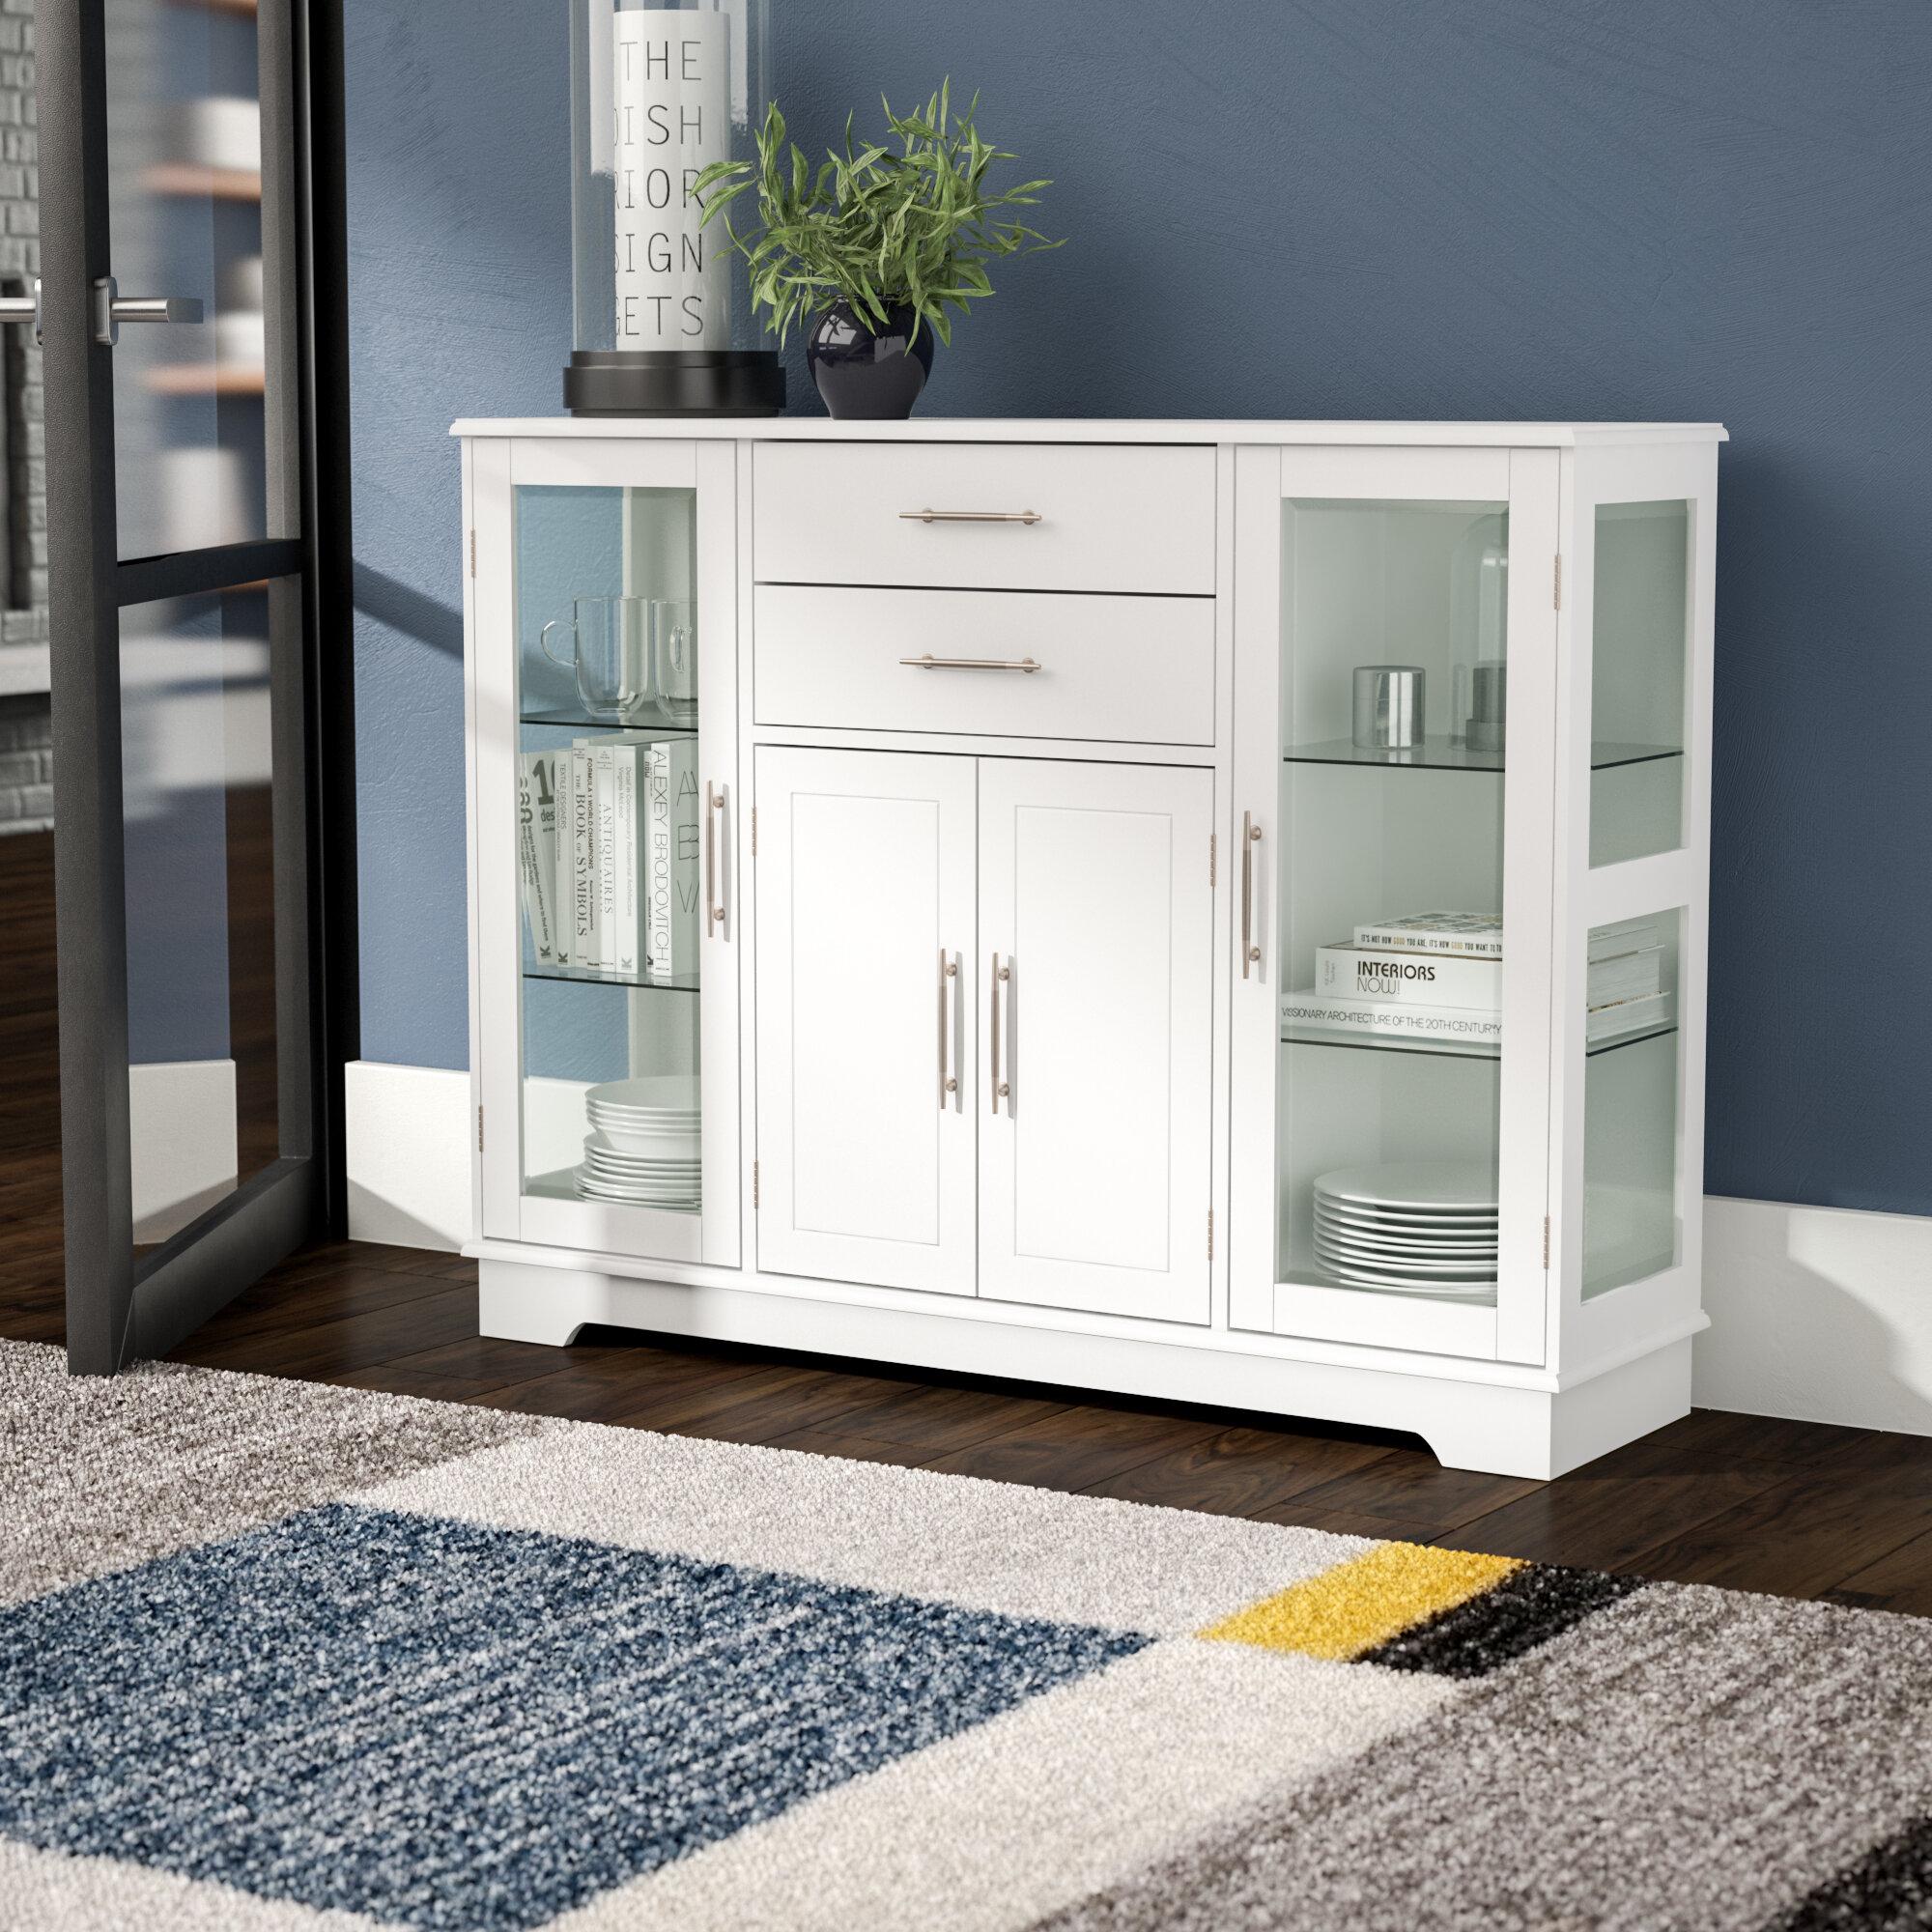 Latitude Run Dufferin Wood Storage 2 Drawer 4 Door Accent Cabinet